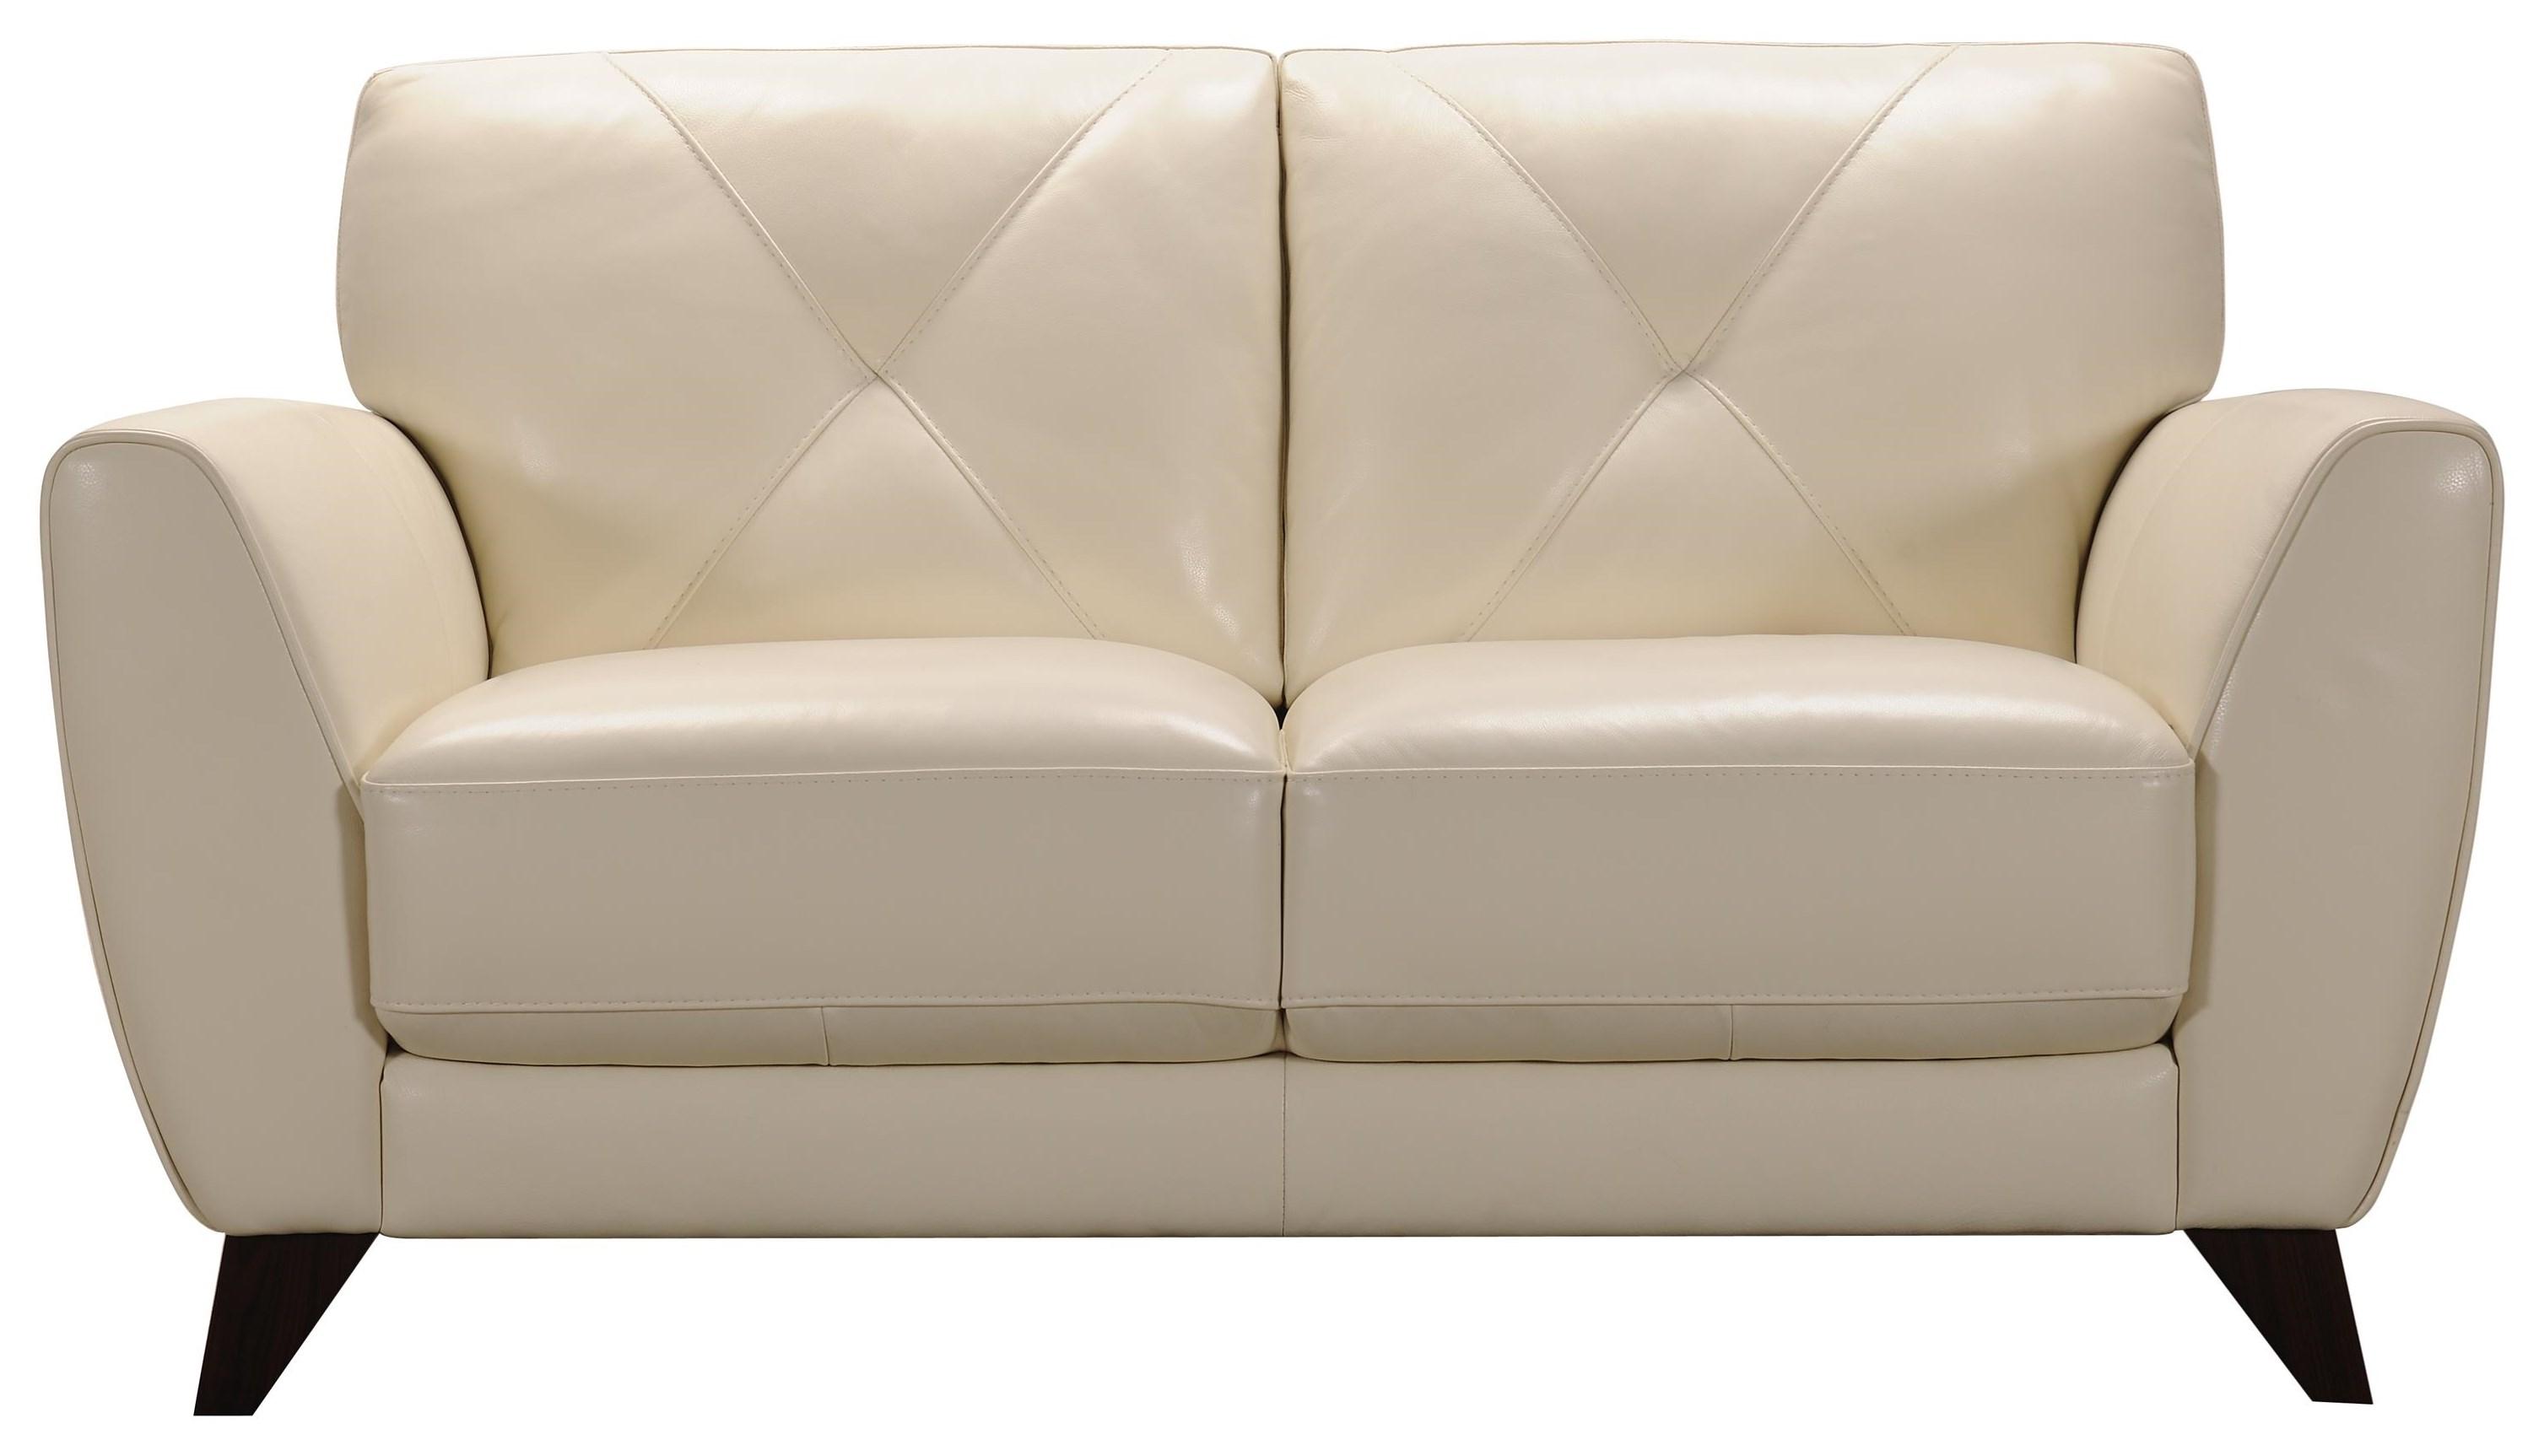 Ivory Leather Loveseat